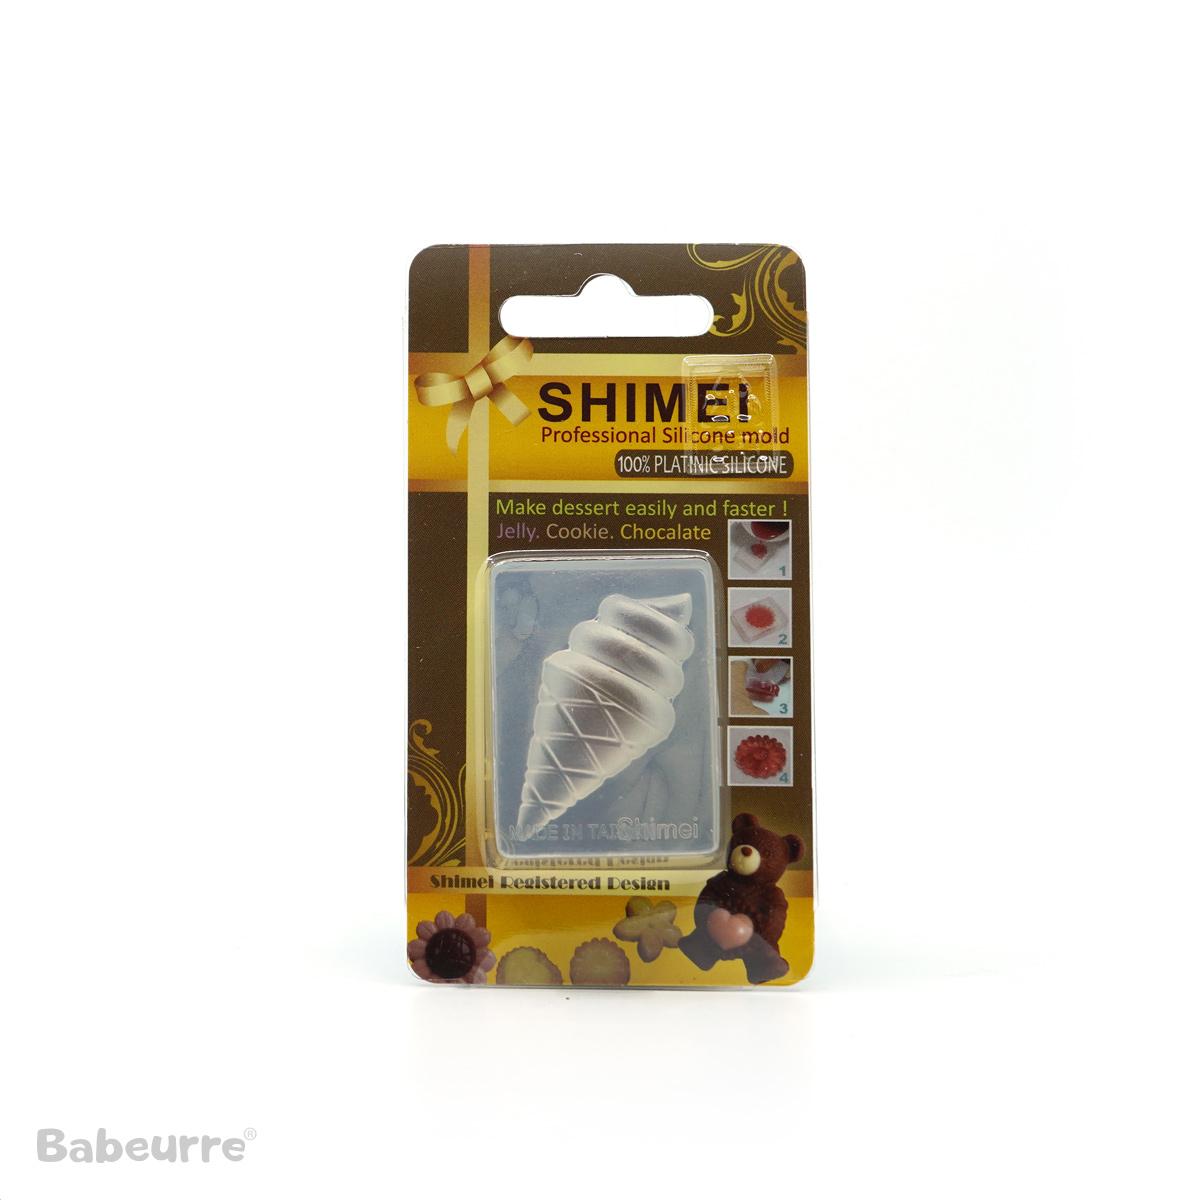 Shimei mallen Soft Mold Icecream